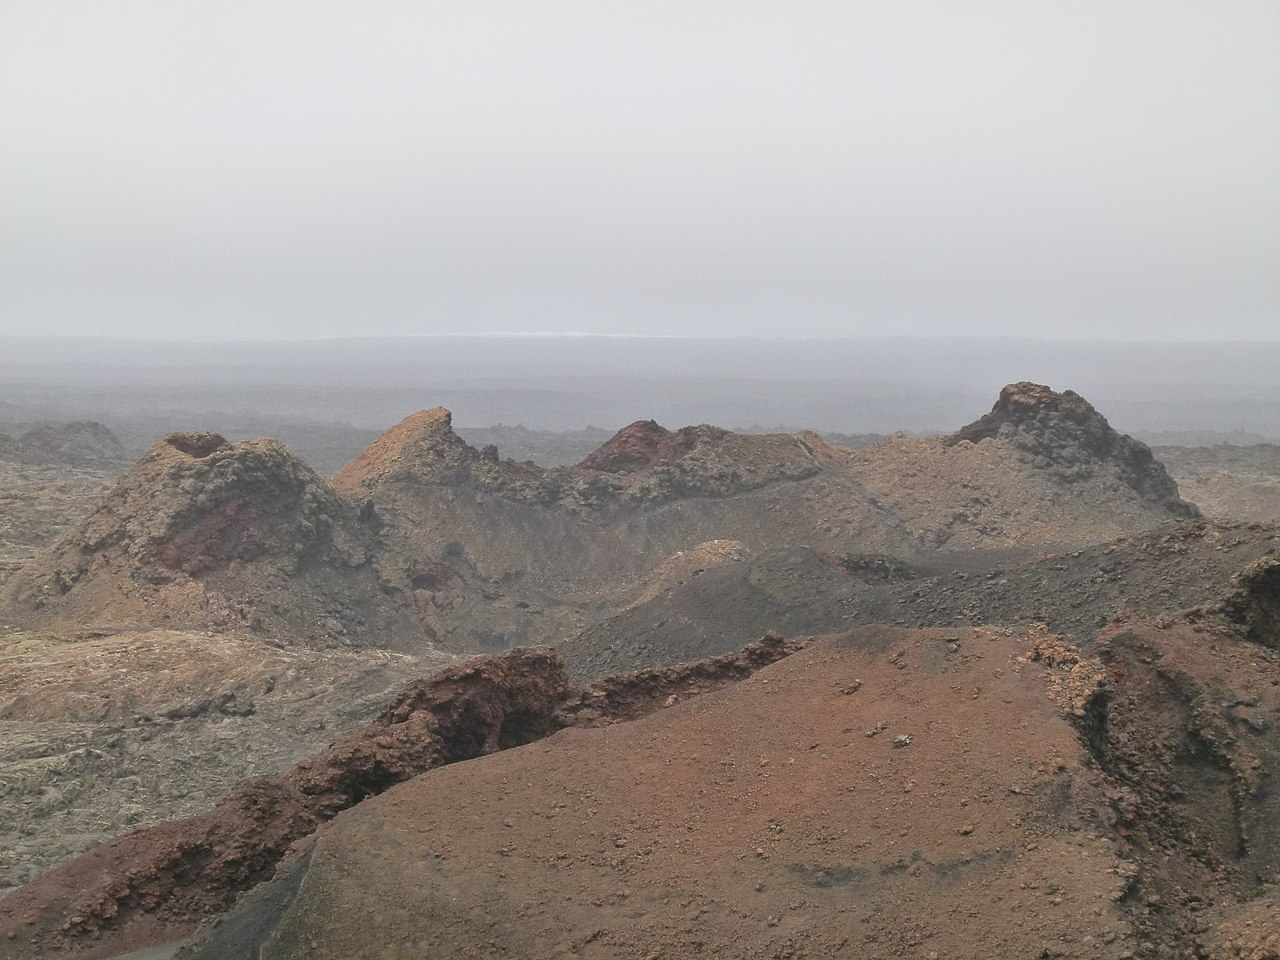 File Montanas Del Fuego Timanfaya National Park On A Foggy Rainy Day Lanzarote 05 Jpg Wikimedia Commons